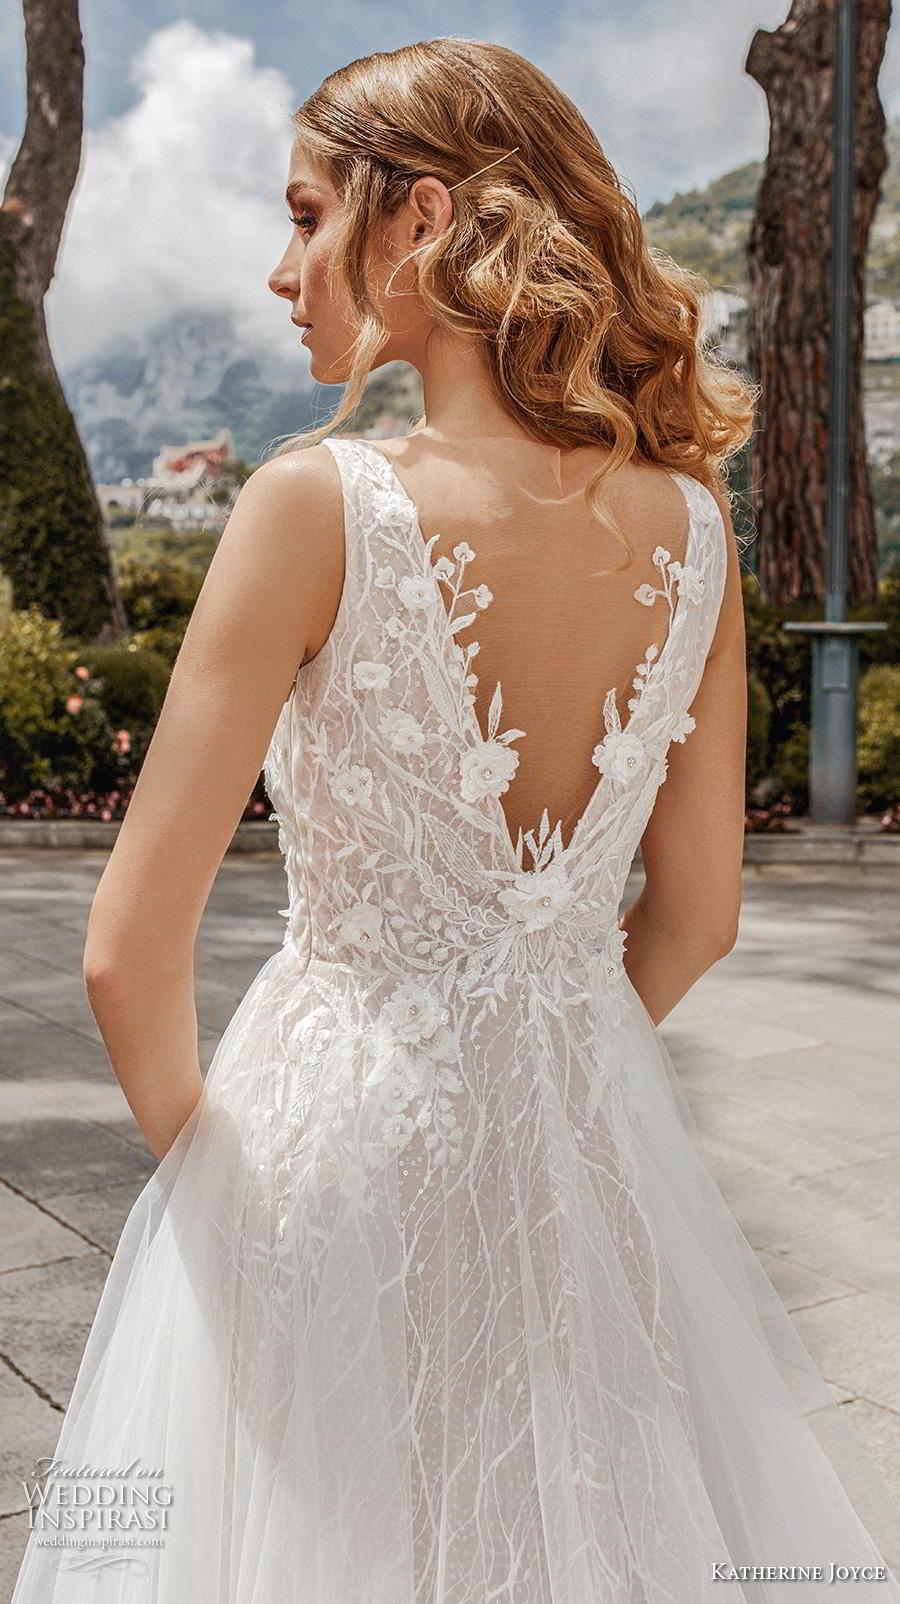 katherine joyce 2019 bridal sleeveless deep v neck heavily embellished bodice tulle skirt romantic a  line wedding dress v back chapel train (3) zbv